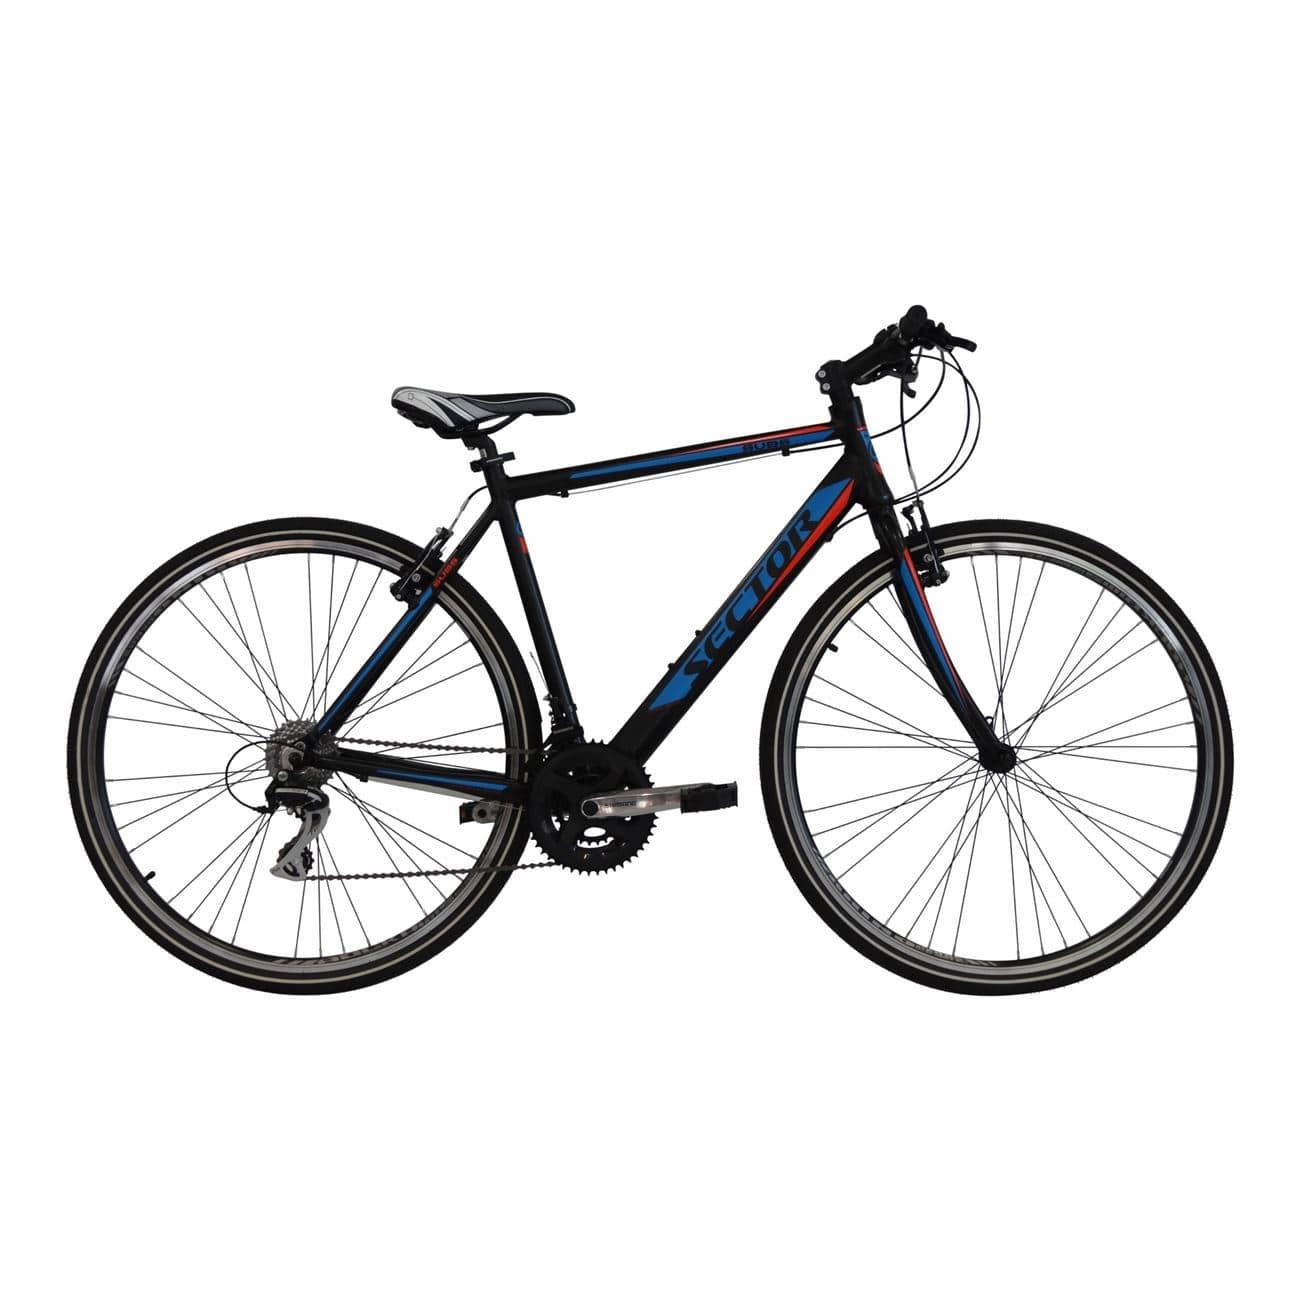 "Sector Ποδήλατο Trecking 28"" - Ποδήλατο Πόλης/Trekking"